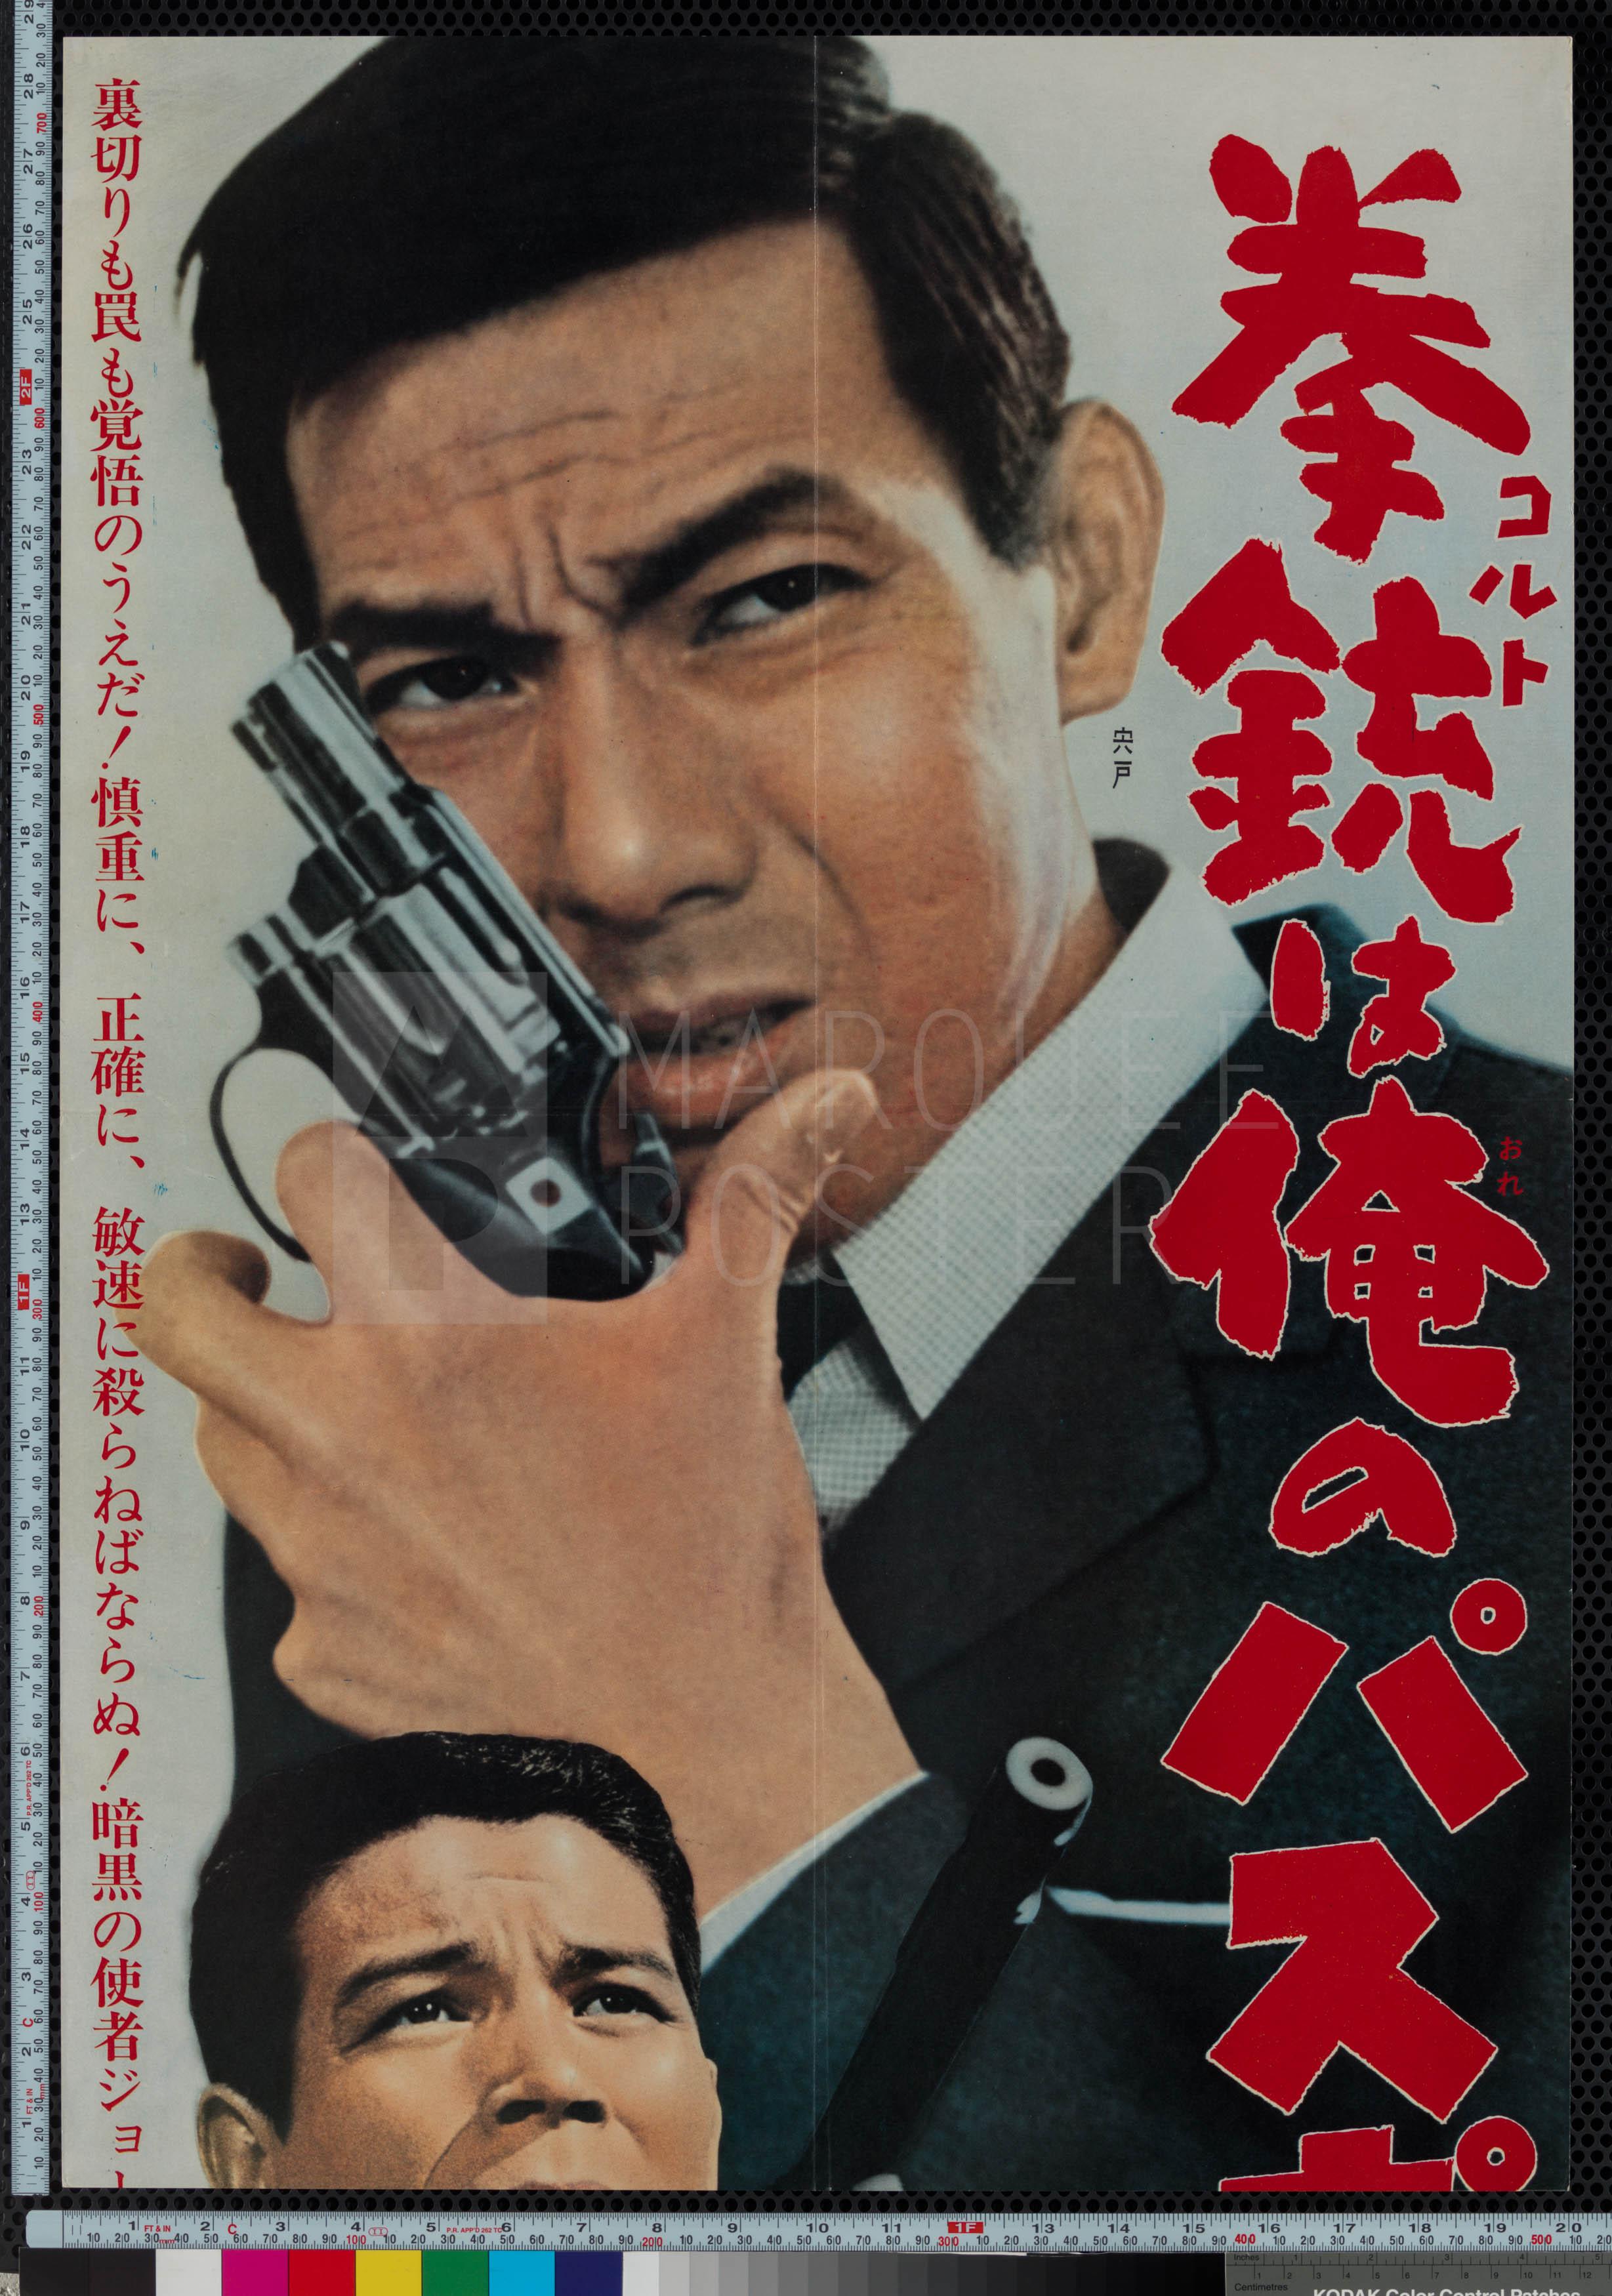 20-colt-is-my-passport-japanese-stb-1967-02